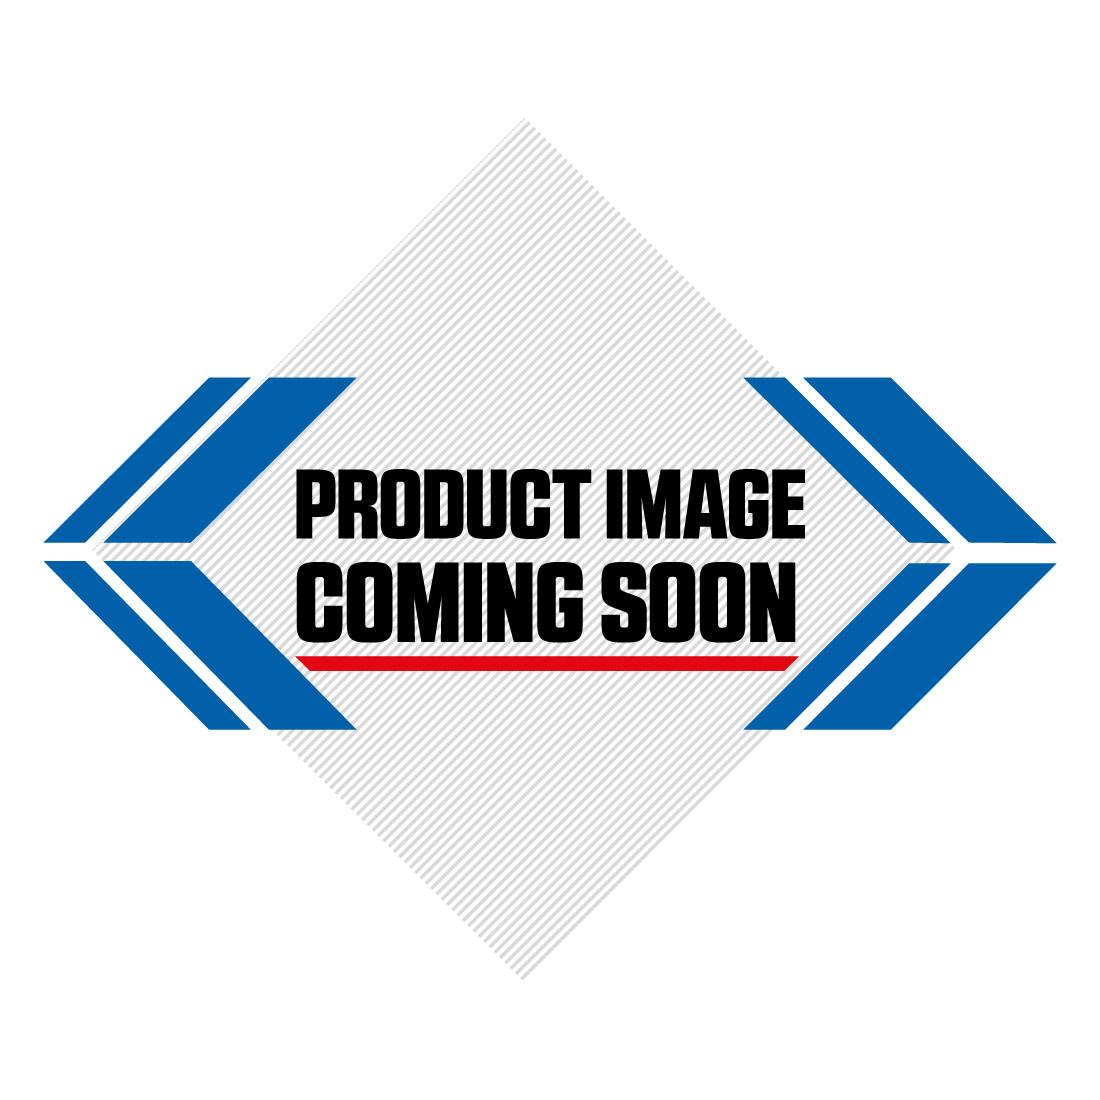 DJI Mavic Pro Fly More Combo 4K Quadcopter Drone Image-5>